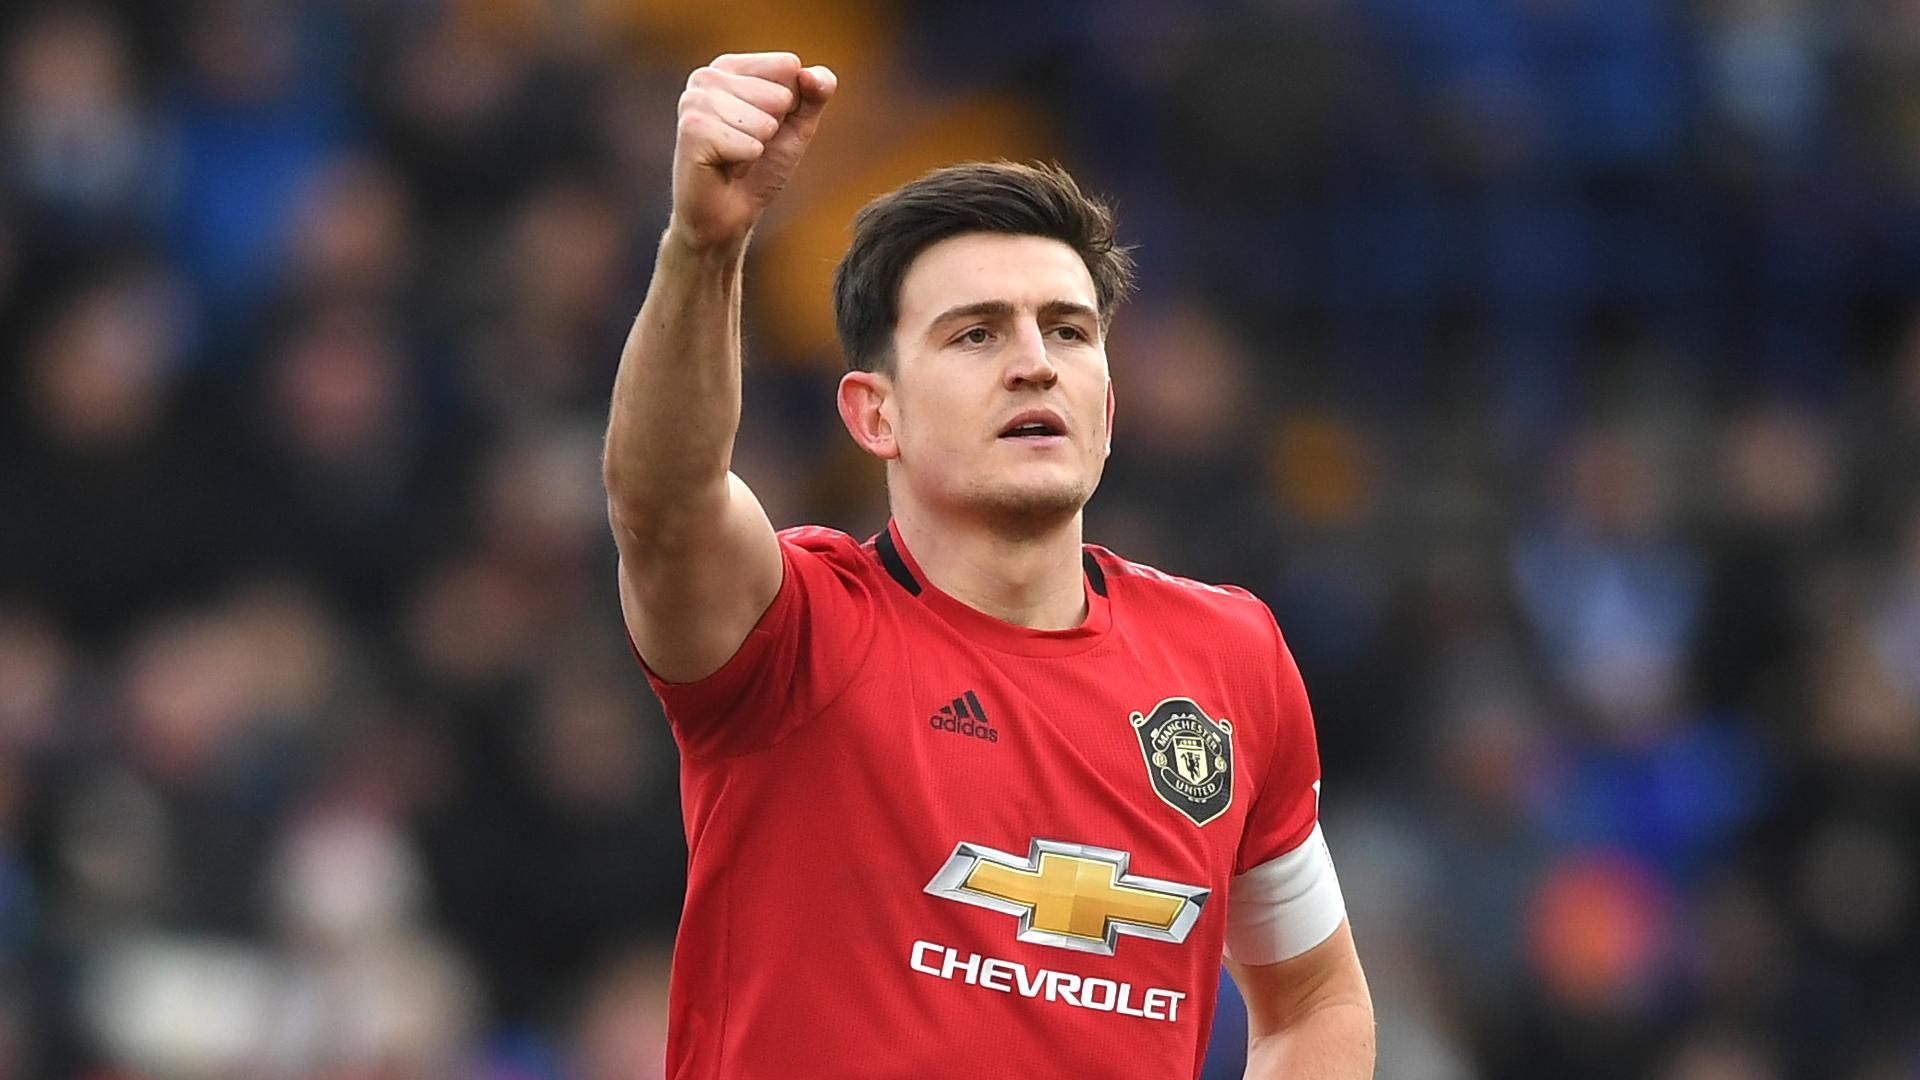 'So safe' - Maguire impressed with Man Utd's training return